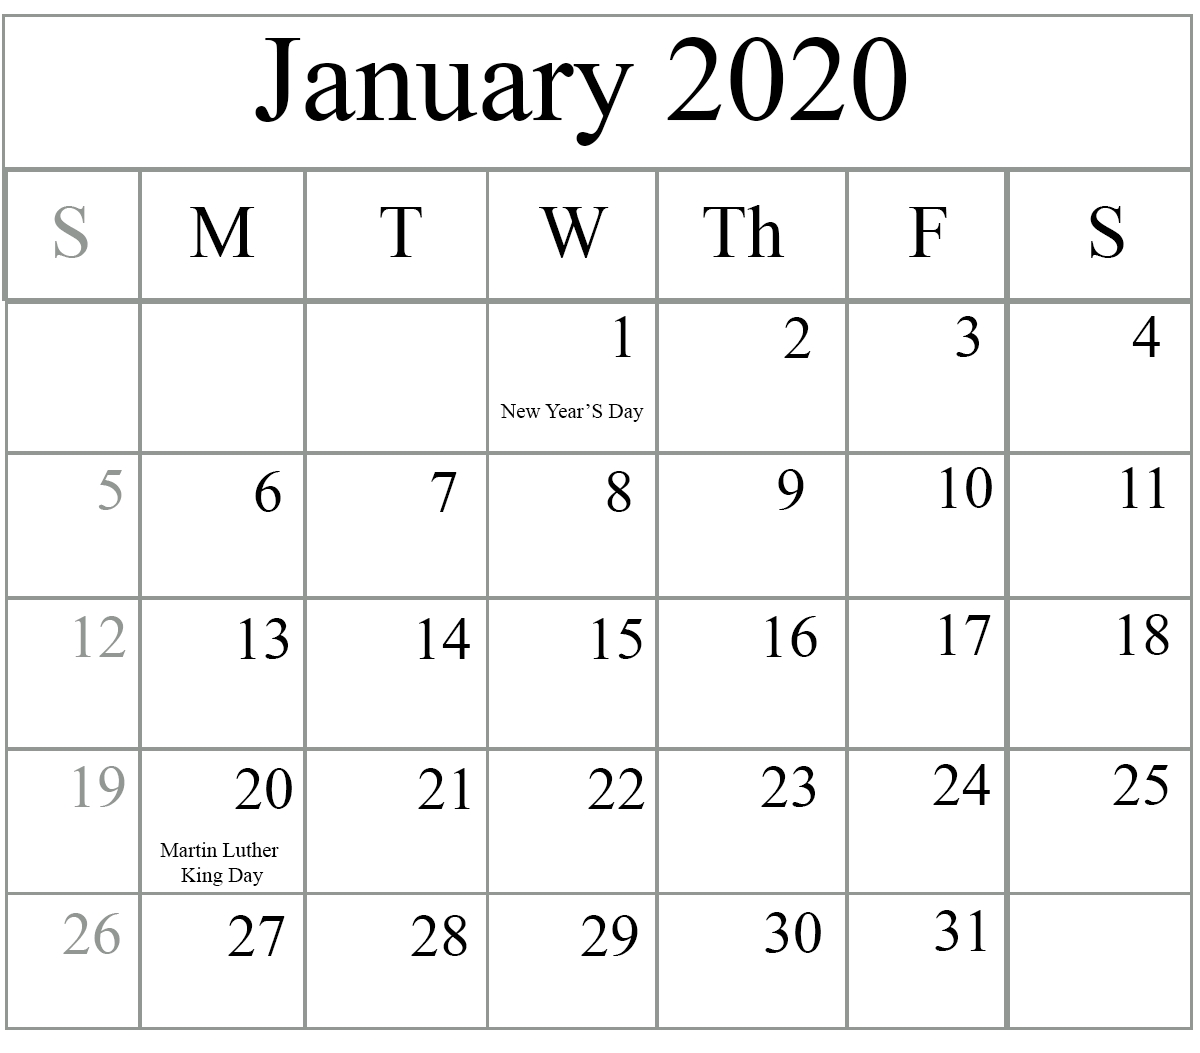 Free January 2020 Printable Calendar In Pdf, Excel & Word-January 2020 Calendar Australia